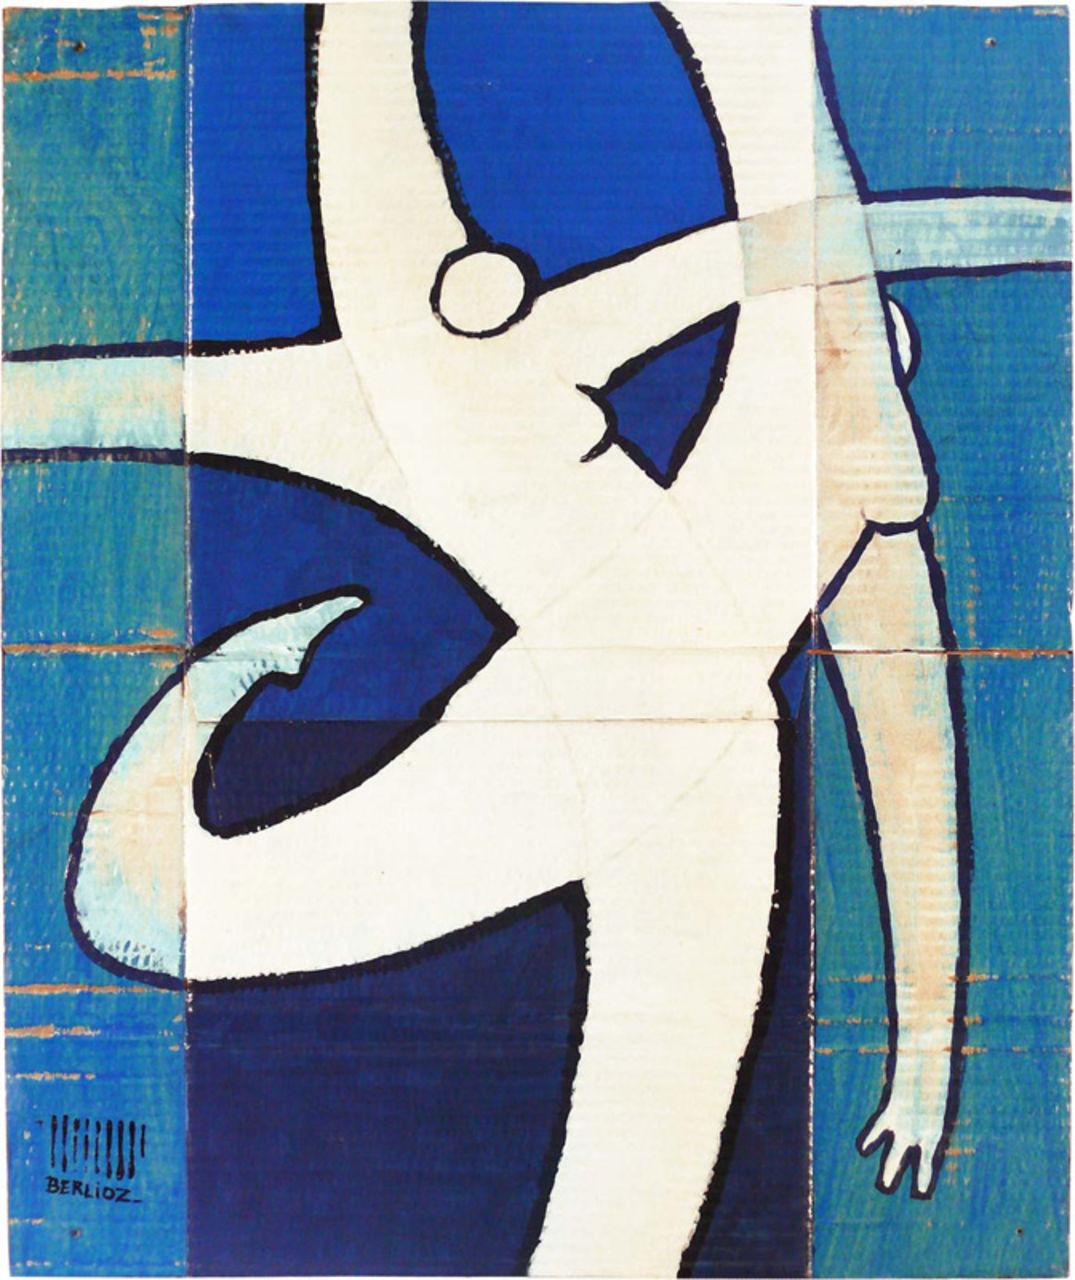 David BERLIOZ Bleu danse